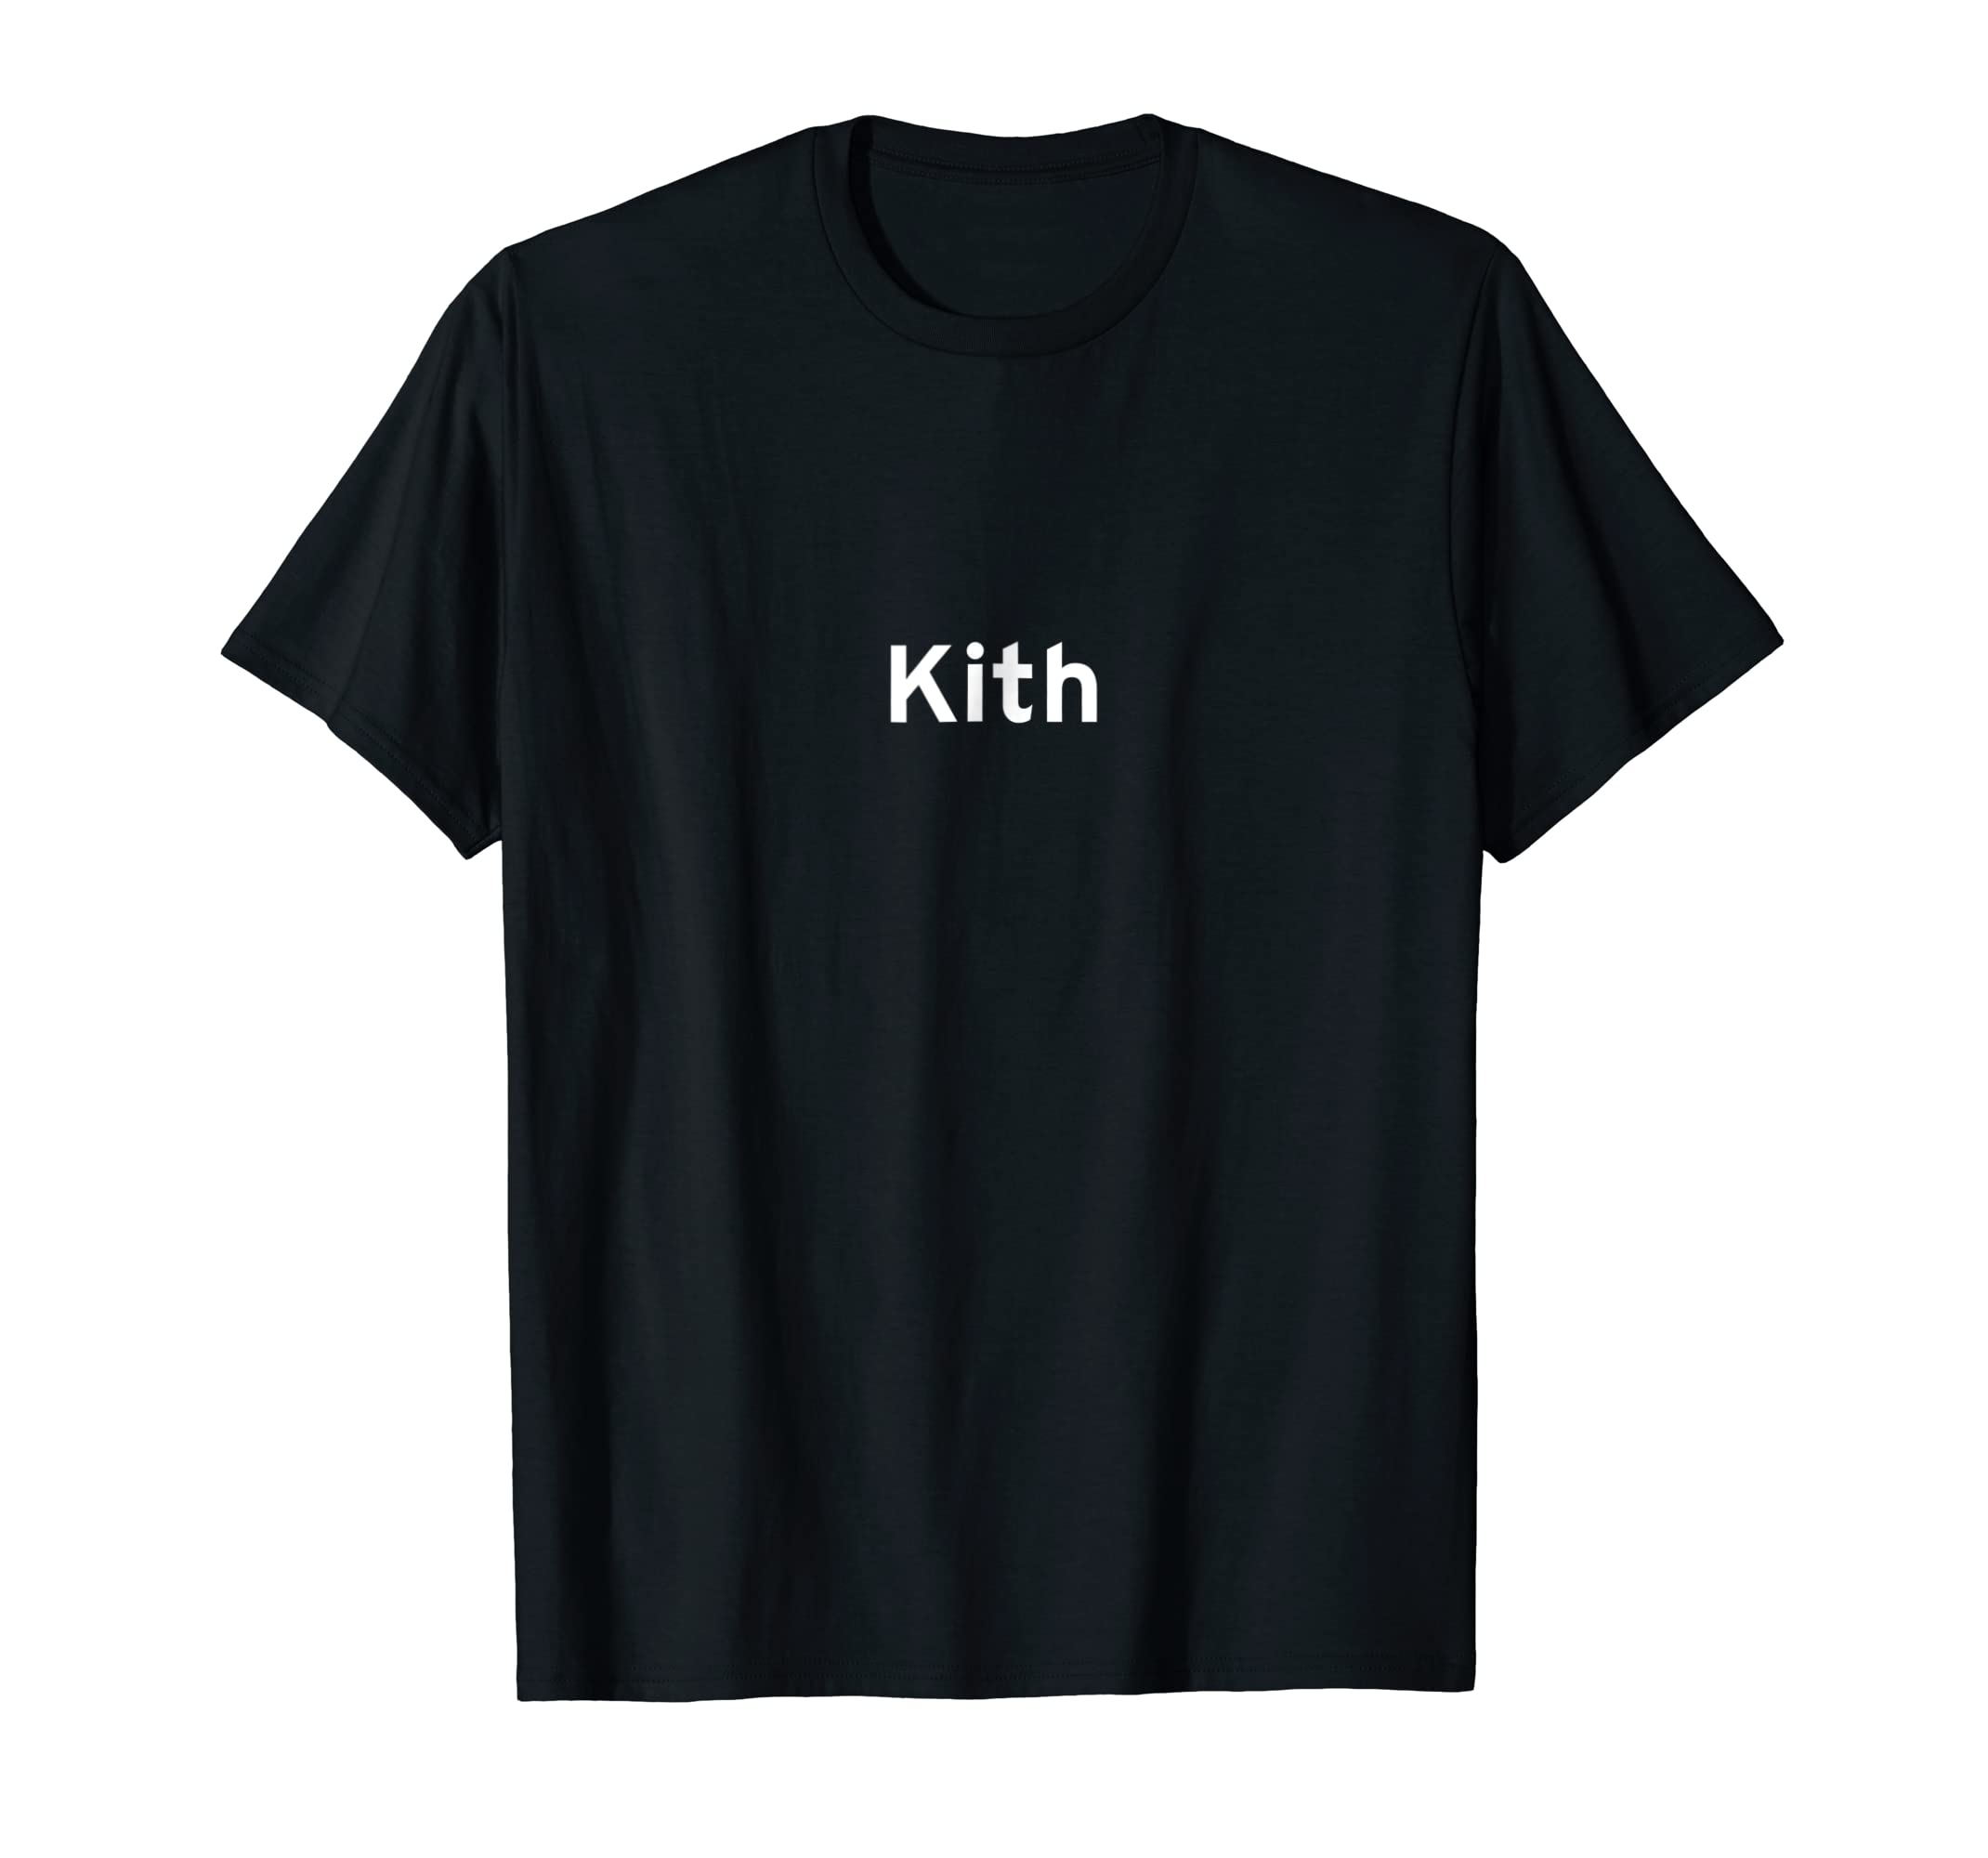 ca7a5a334ce432 Amazon.com: Kith T-shirt: Clothing